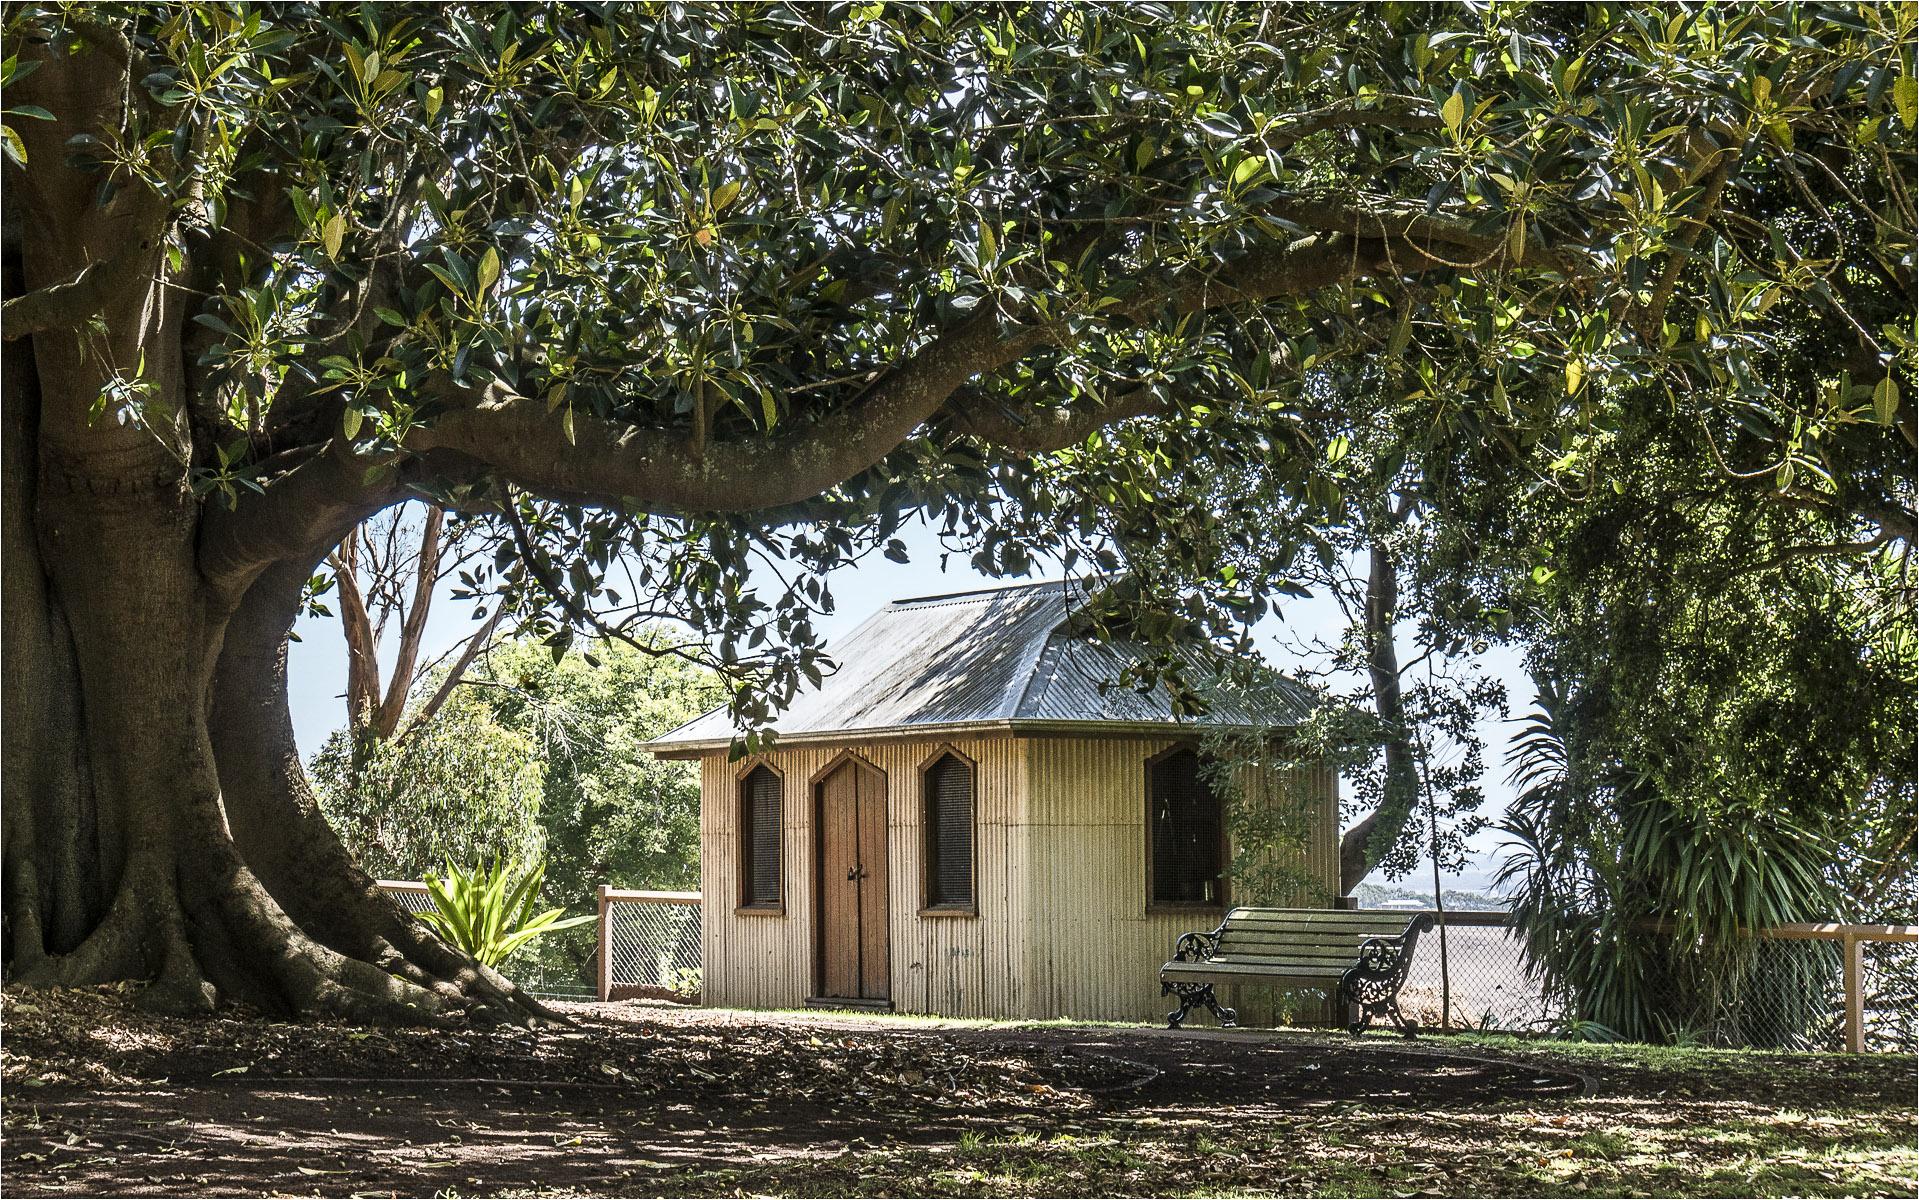 Botanic Garden Shed. Open. Peter Bellmont